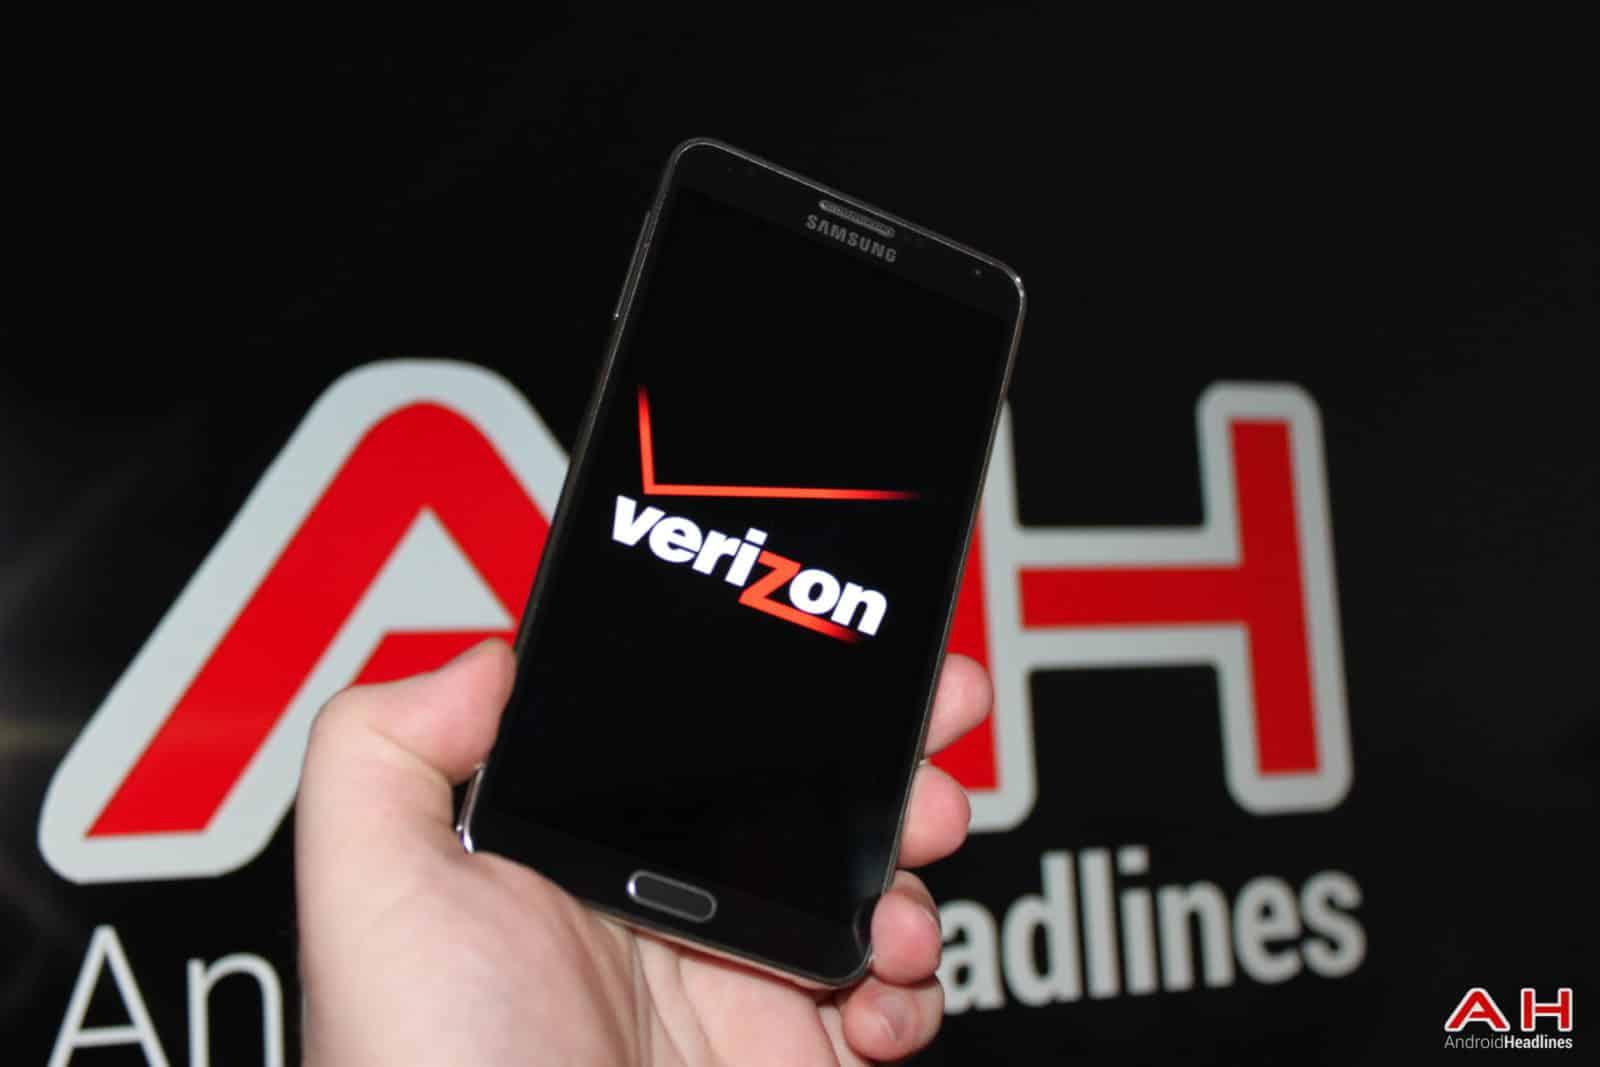 AH Verizon Logo 1.1